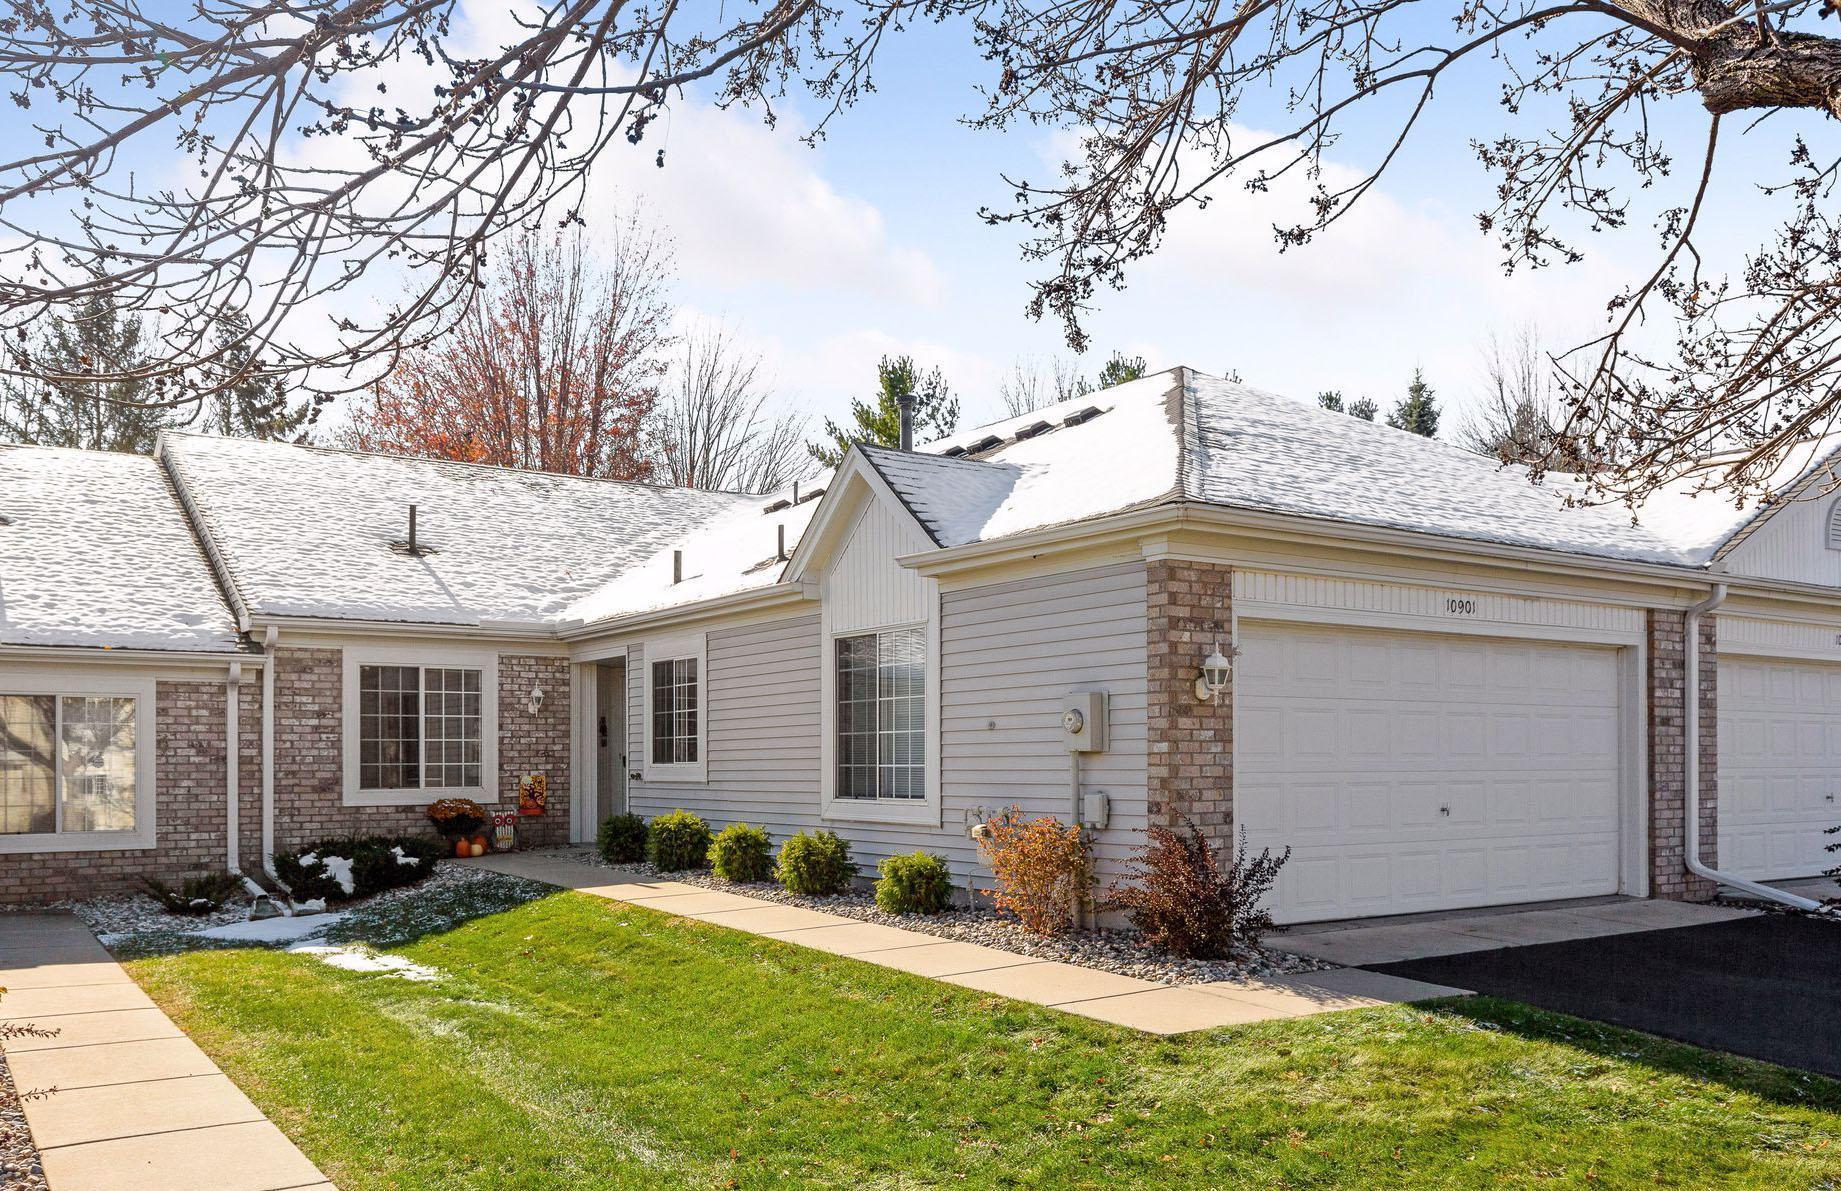 10901 Lexington Drive Property Photo - Eden Prairie, MN real estate listing